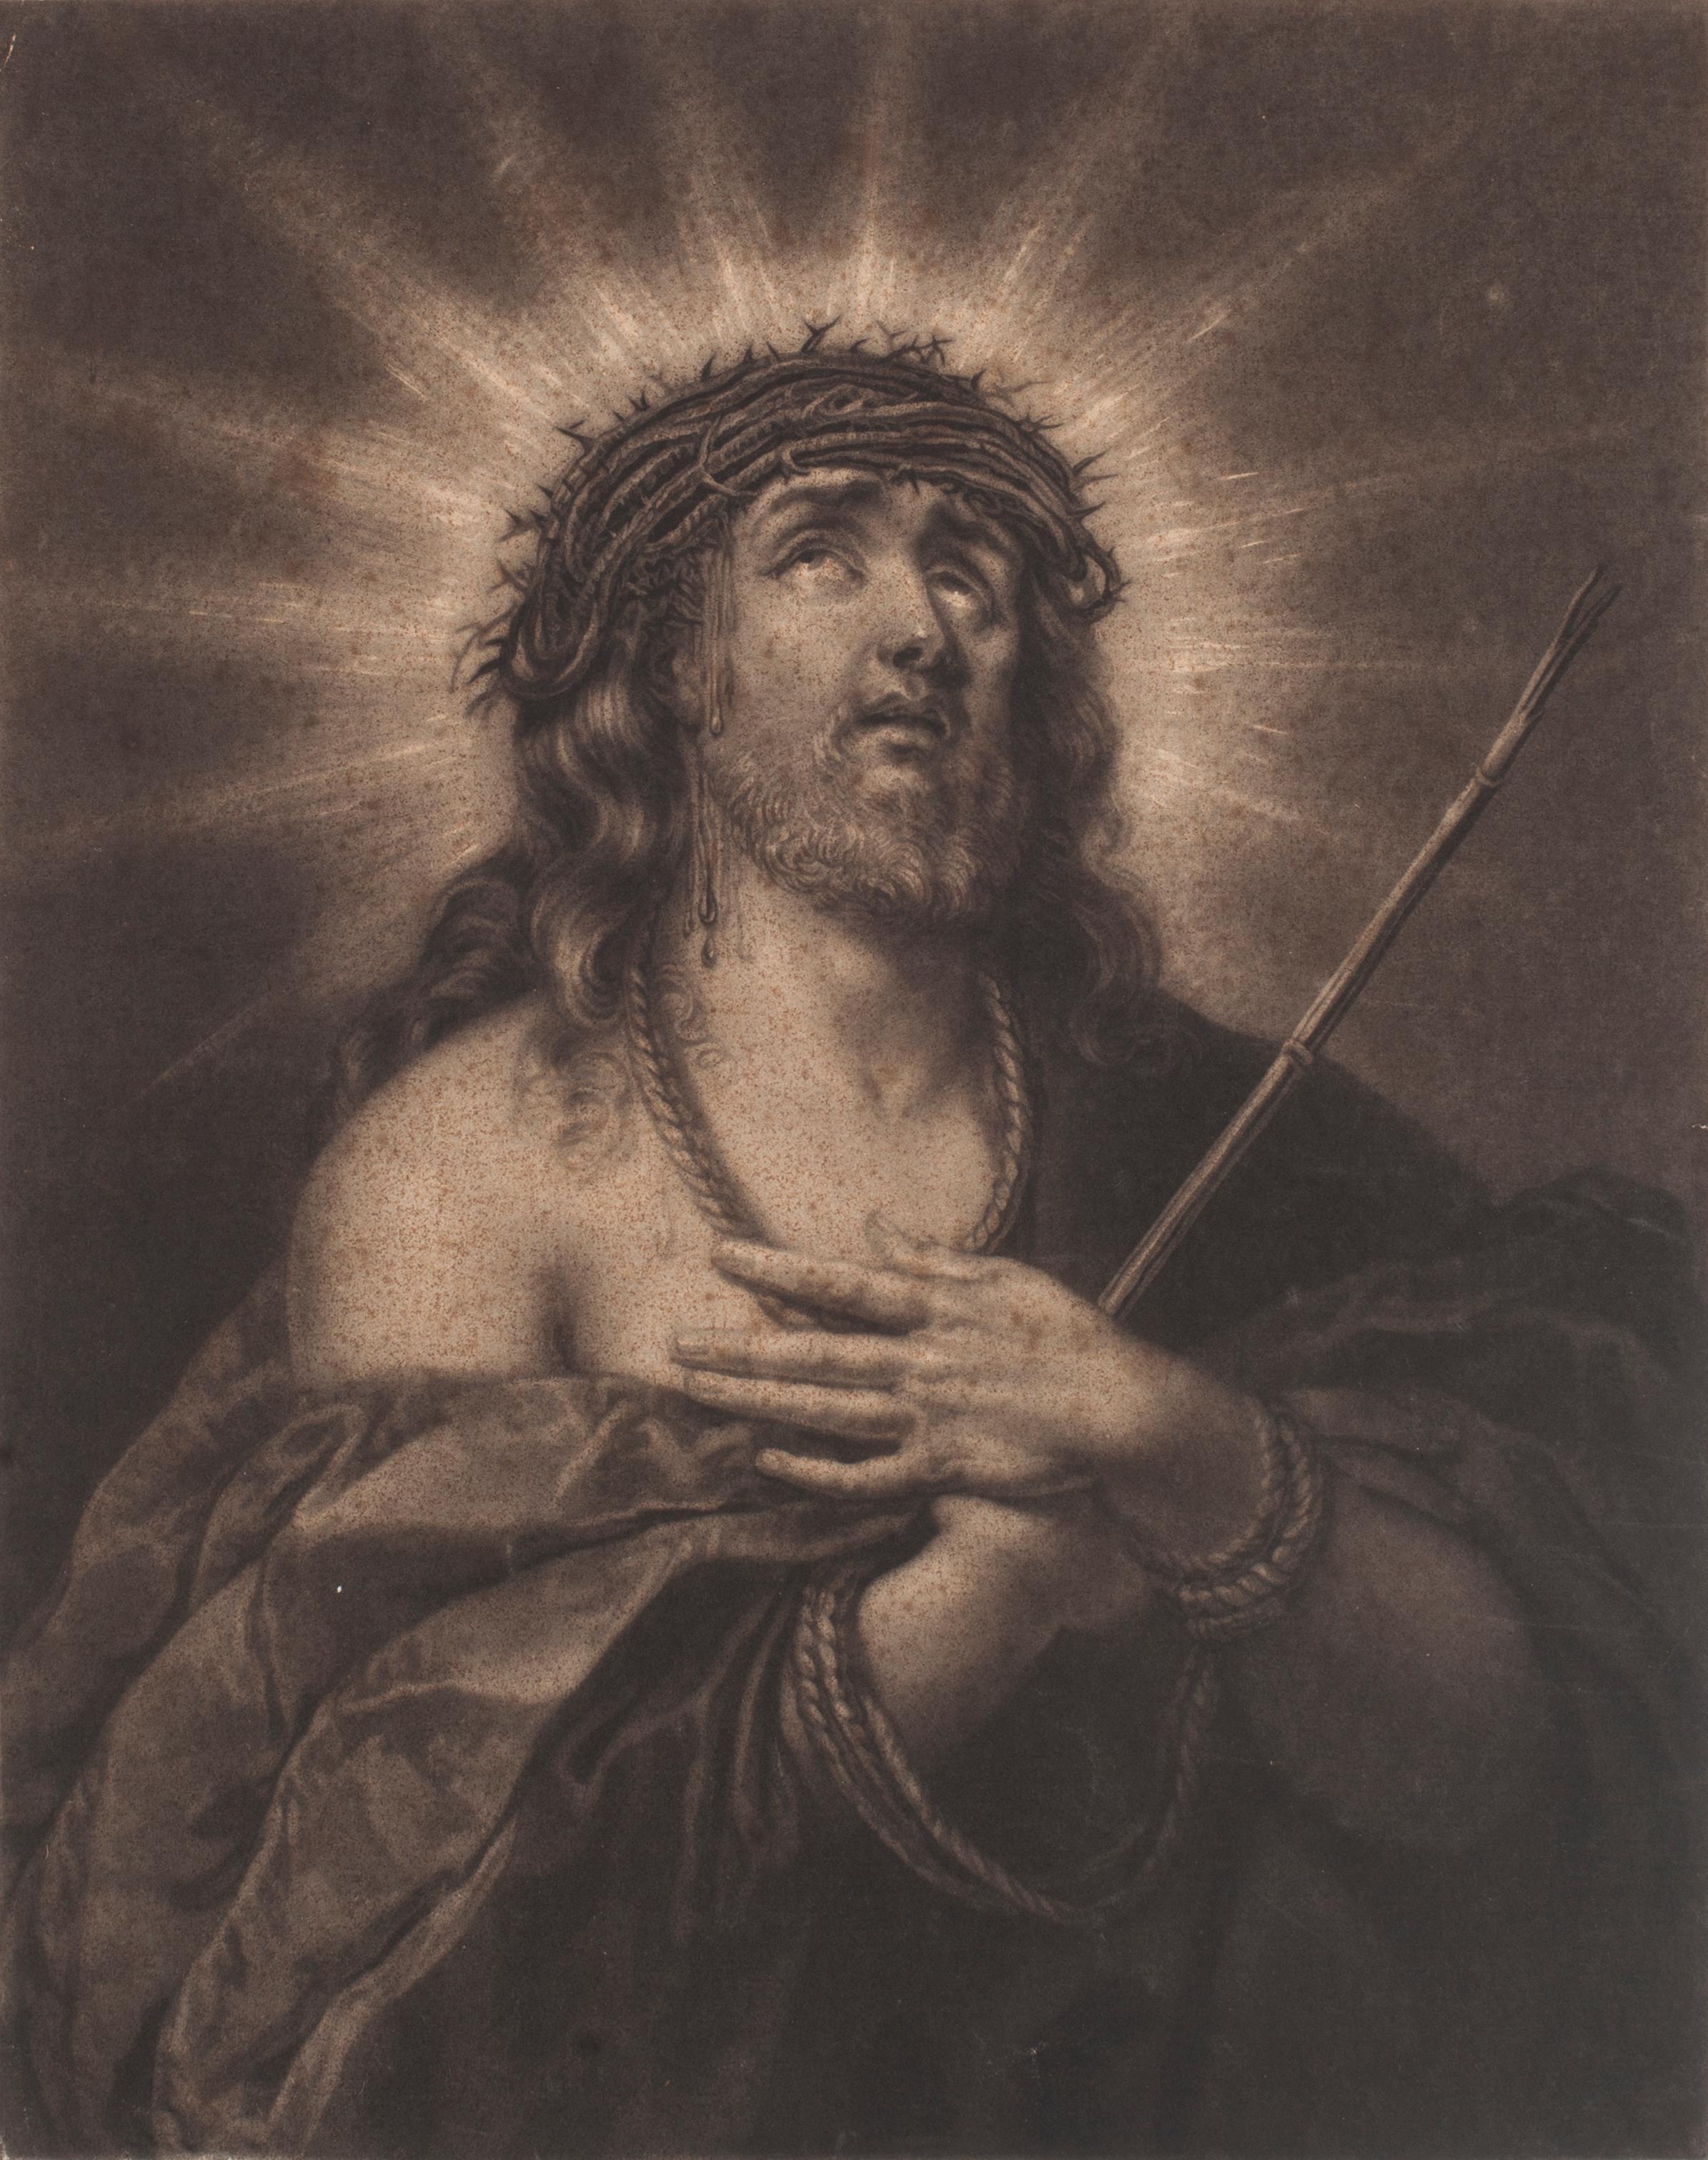 Jesus Christ - Original Etching - 17th Century